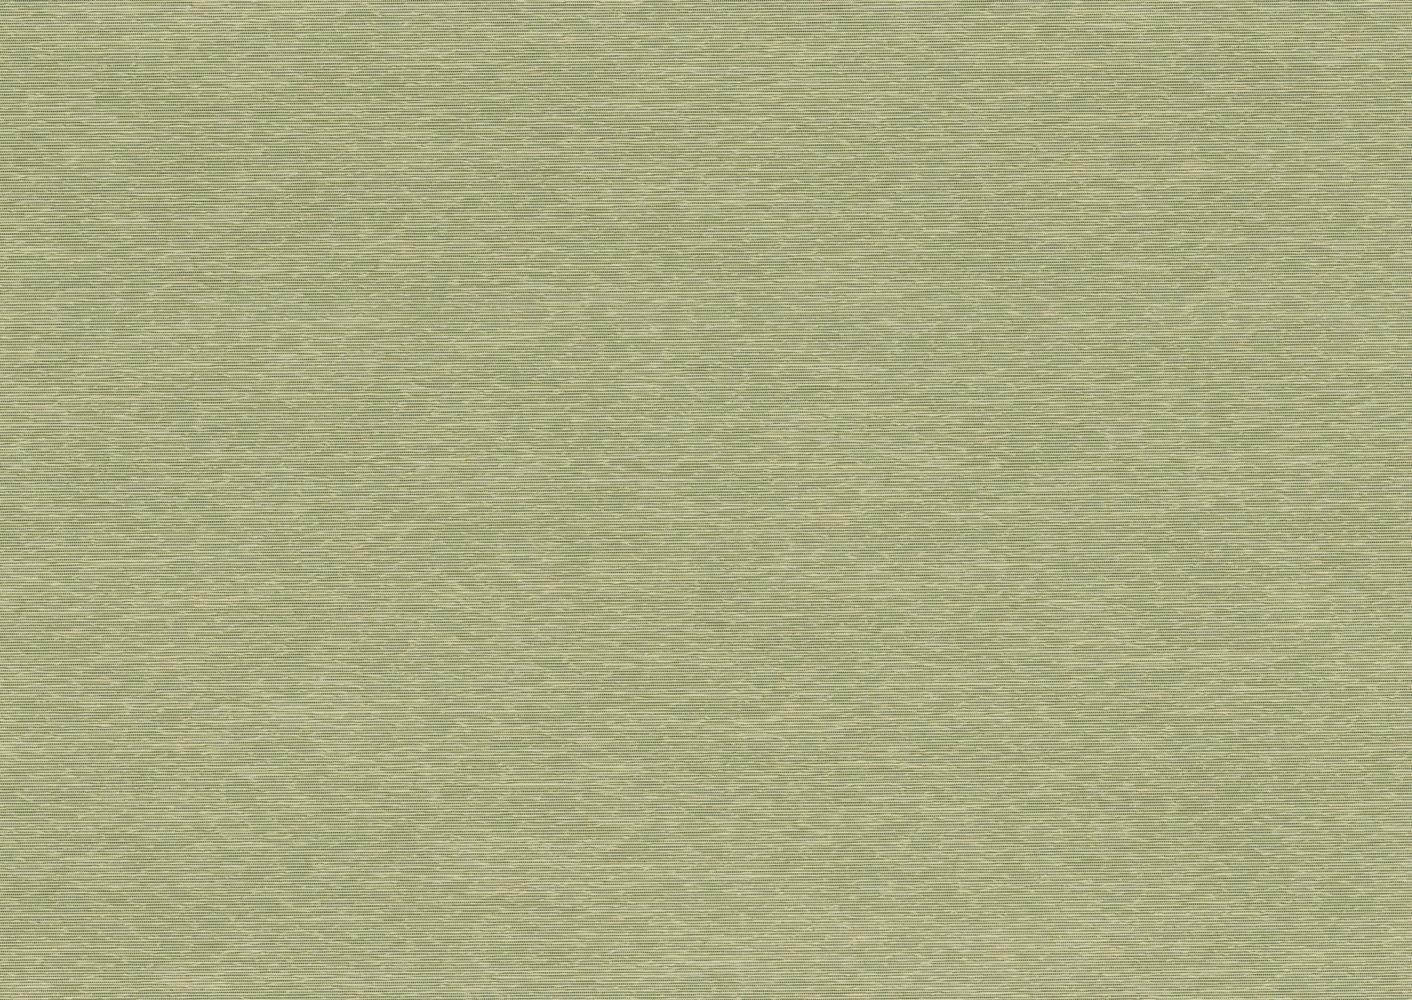 Лусто-светло-зеленый